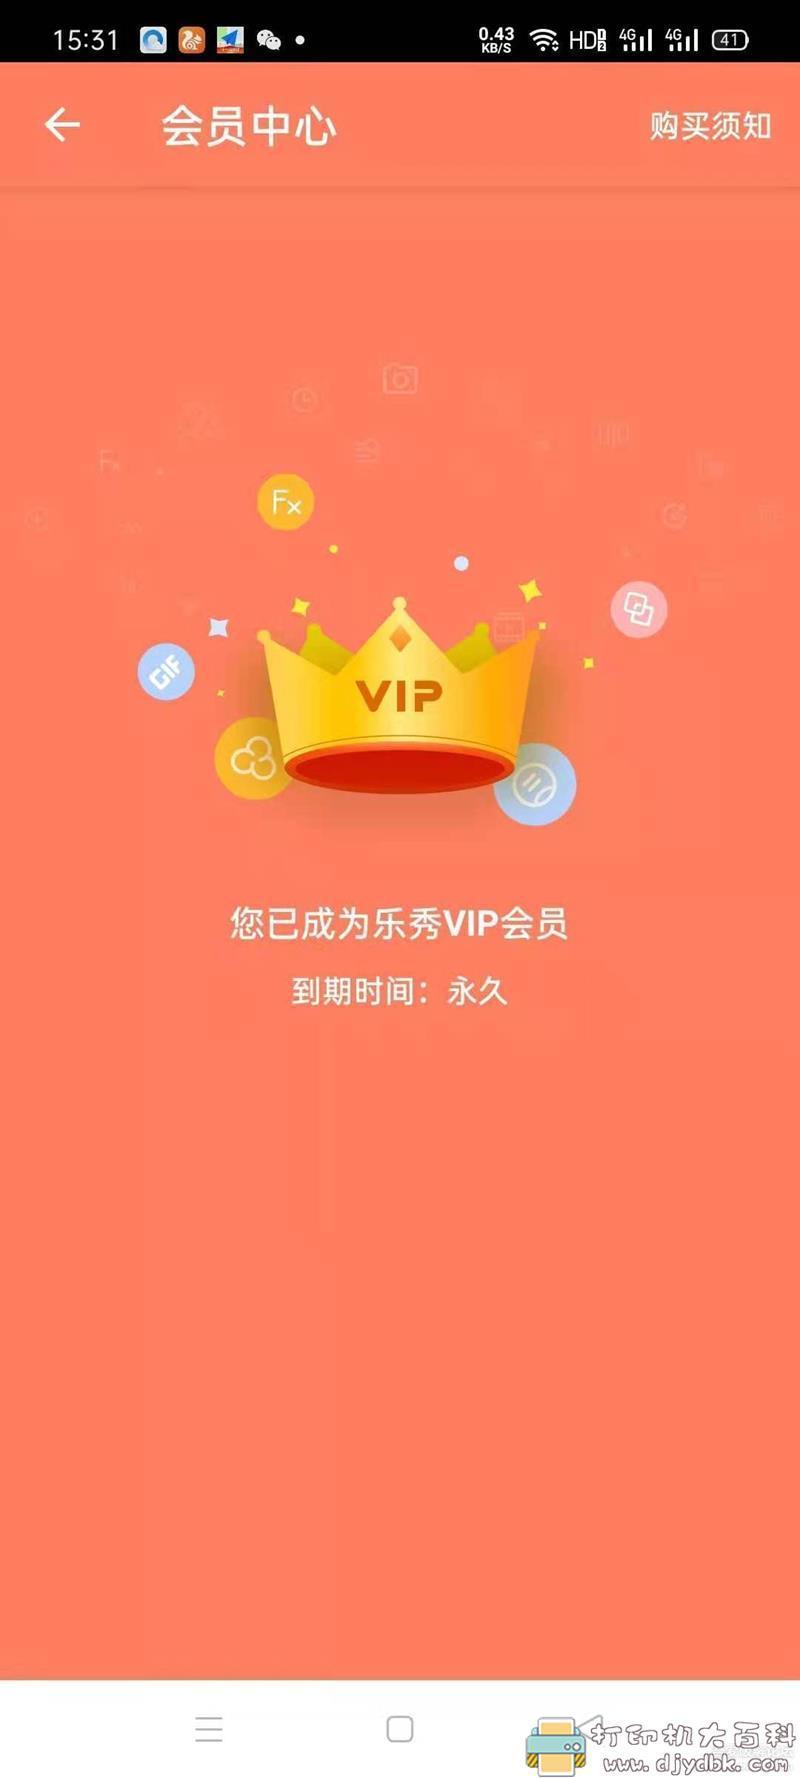 [Android]乐秀视频编辑器专业版(V9.1.16)登录即vip 配图 No.1